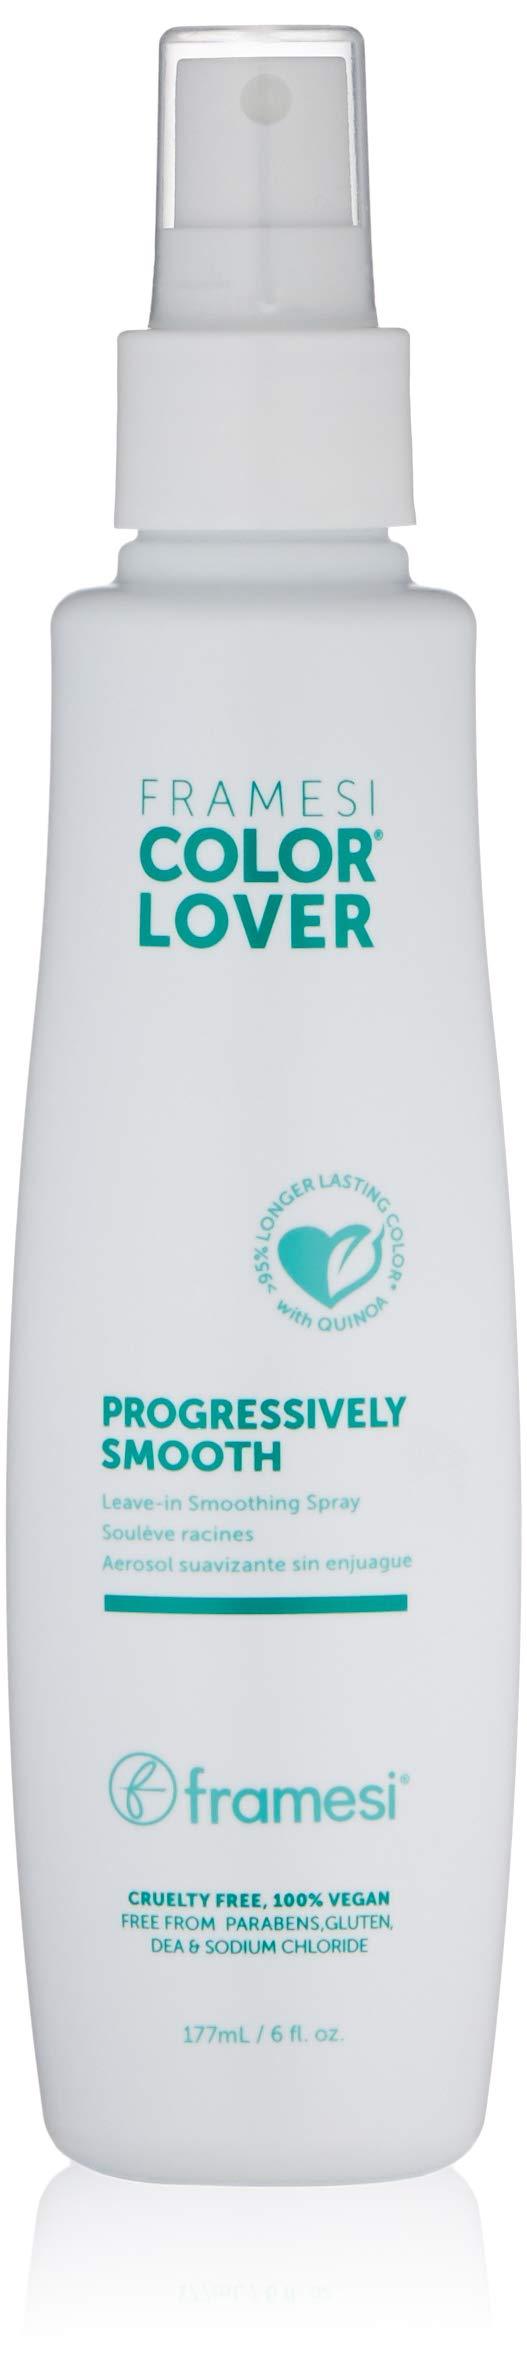 Framesi - Color Lover Progressively Smooth